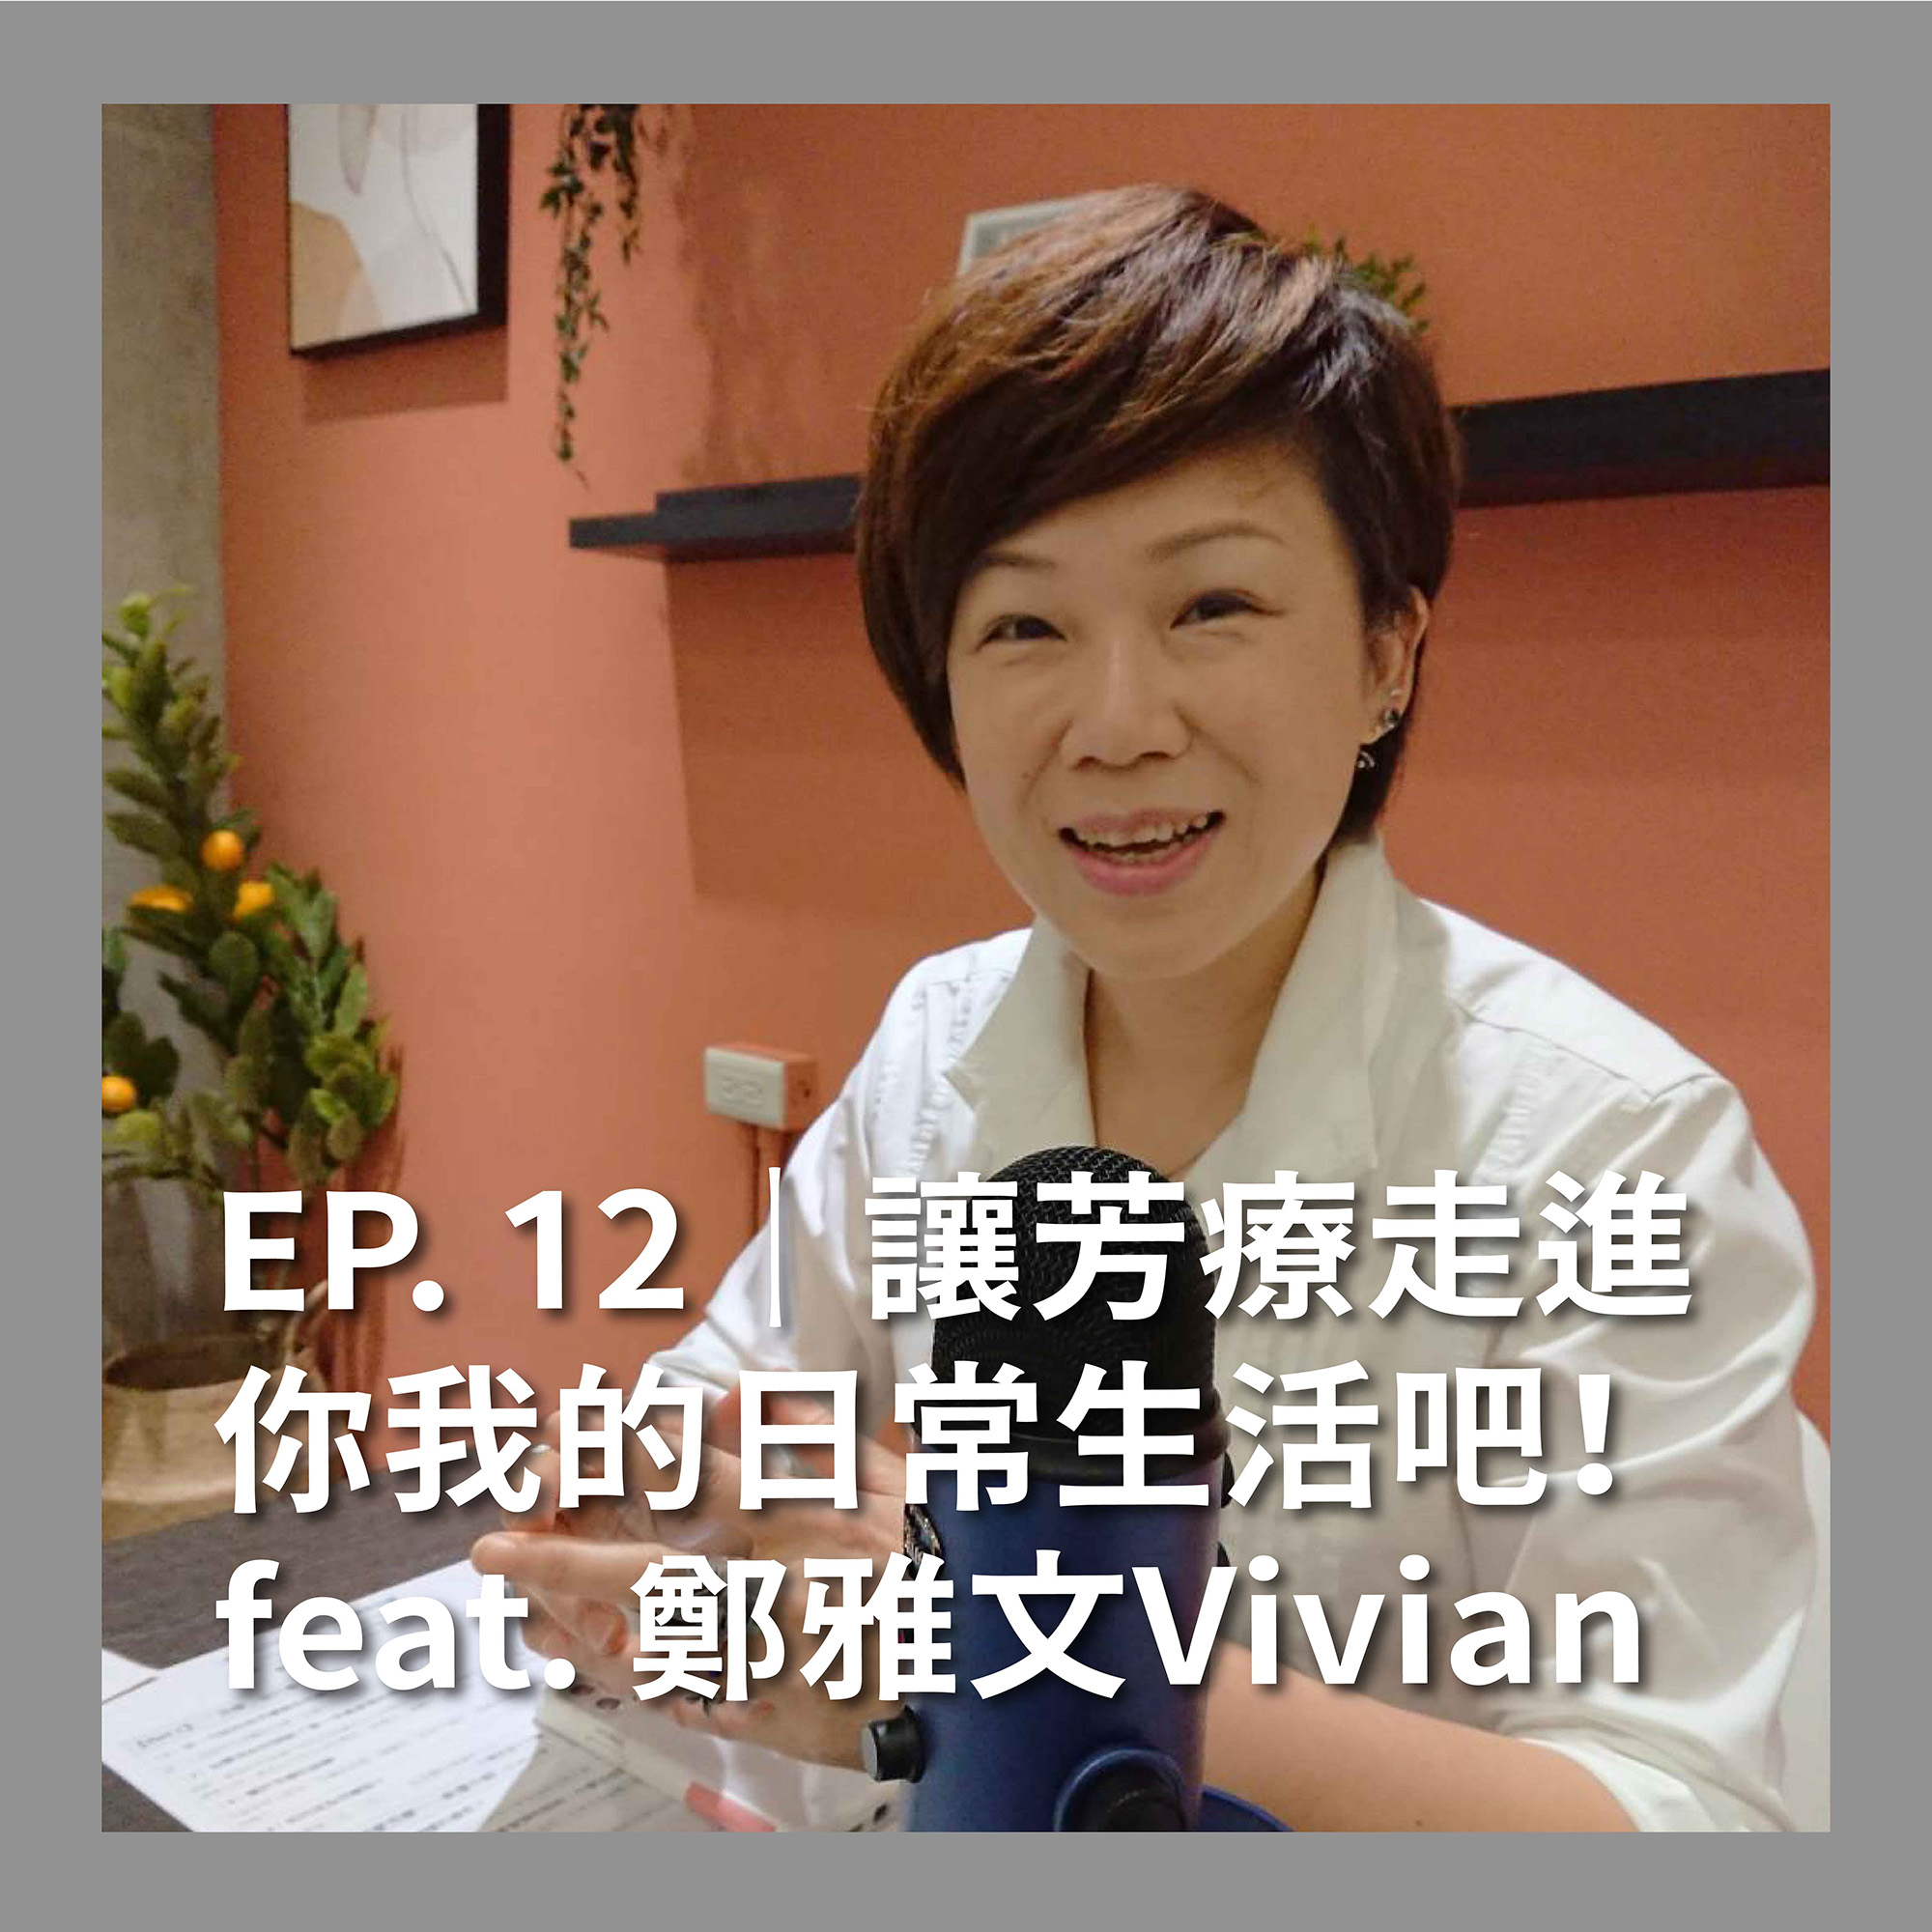 EP. 13|讓芳療走進你我的日常生活吧! feat. 鄭雅文Vivian